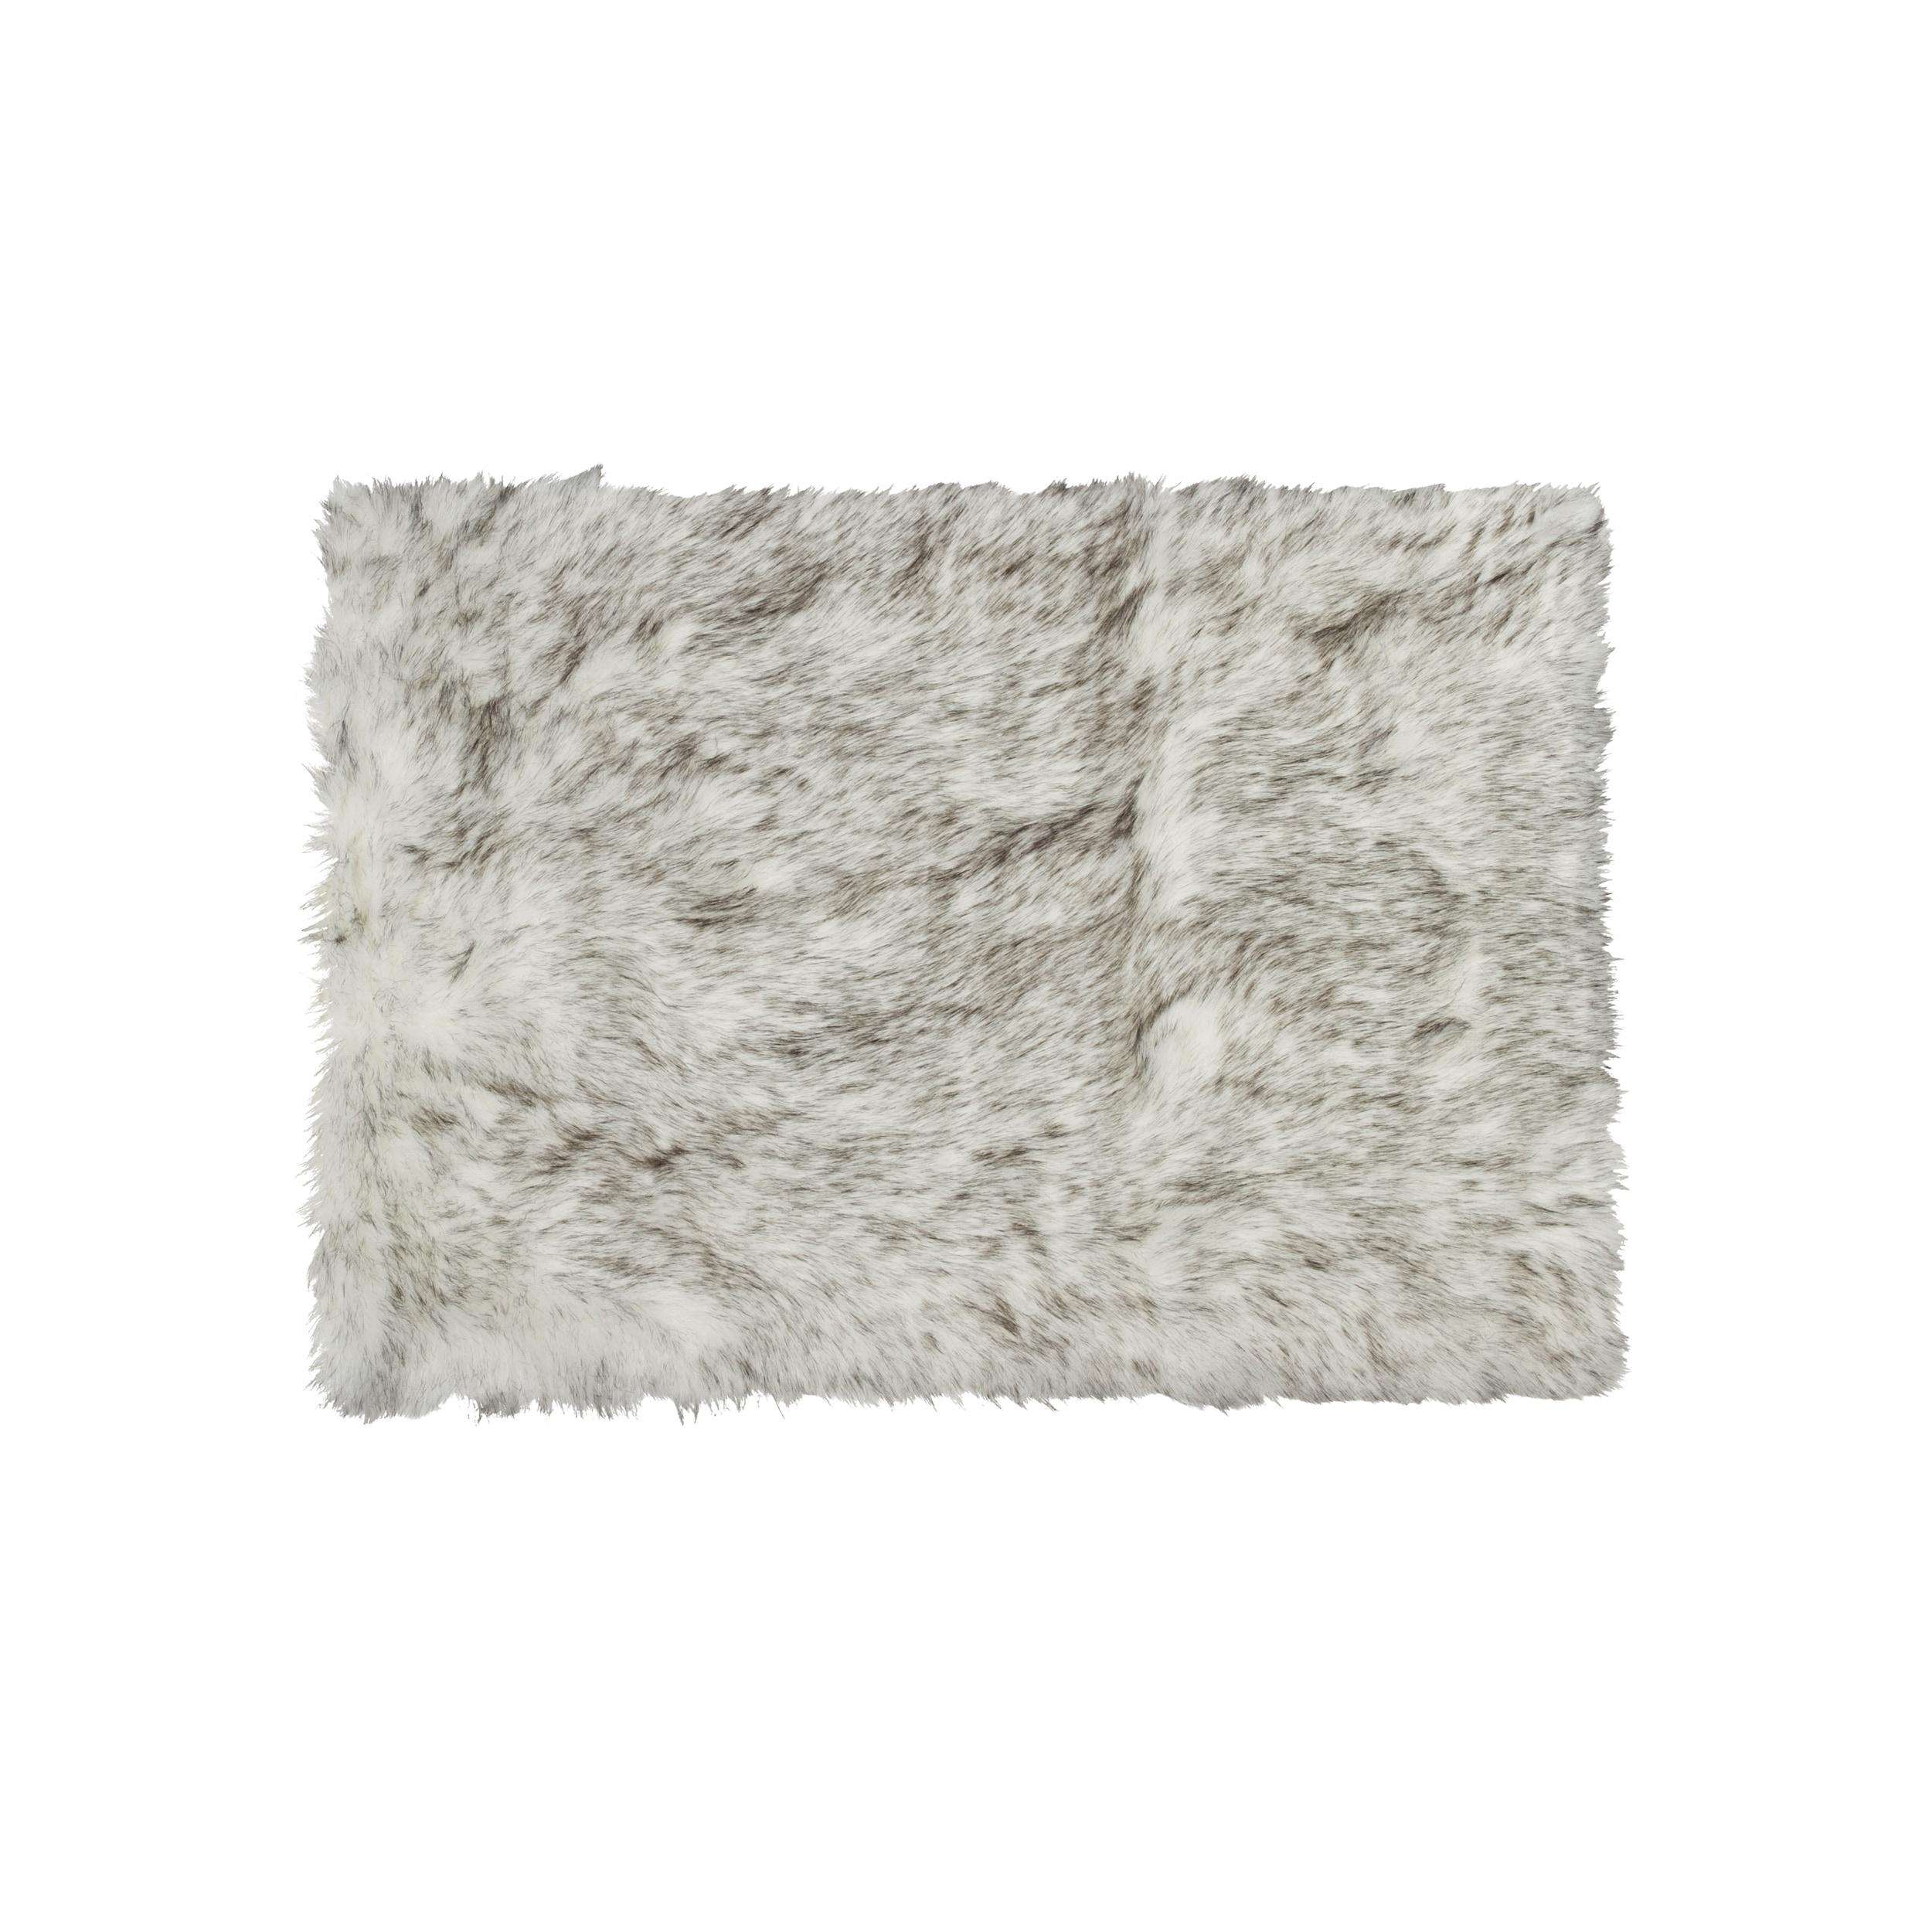 Luxe Hudson Grant Grey Faux Sheepskin Rug Throw 3 X 5